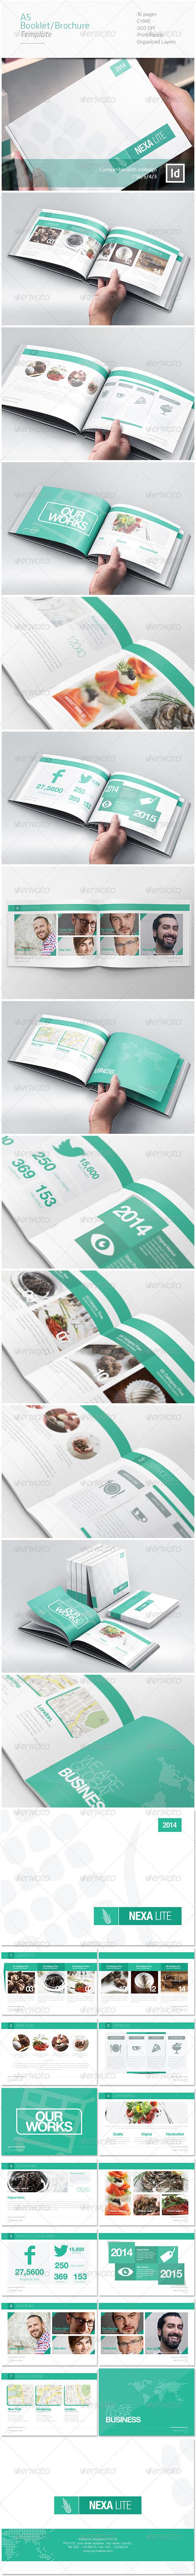 A5 Booklet / Catalogue / Brochure - Corporate Brochures